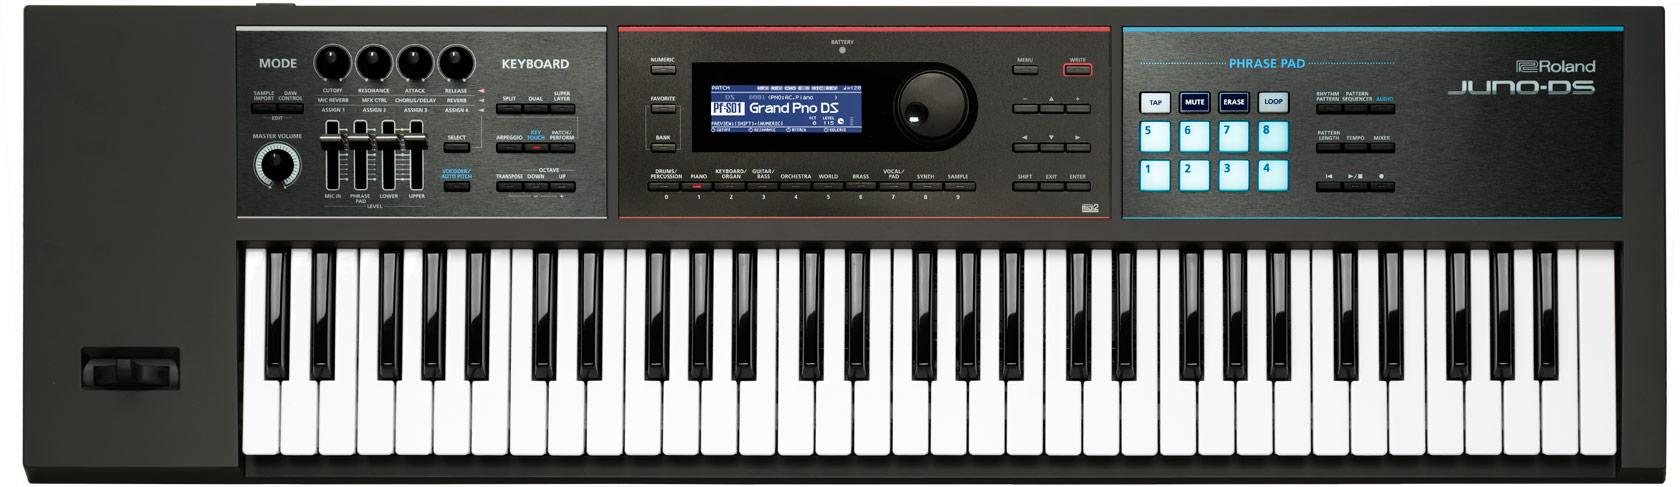 Đàn organ Roland JUNO-DS61